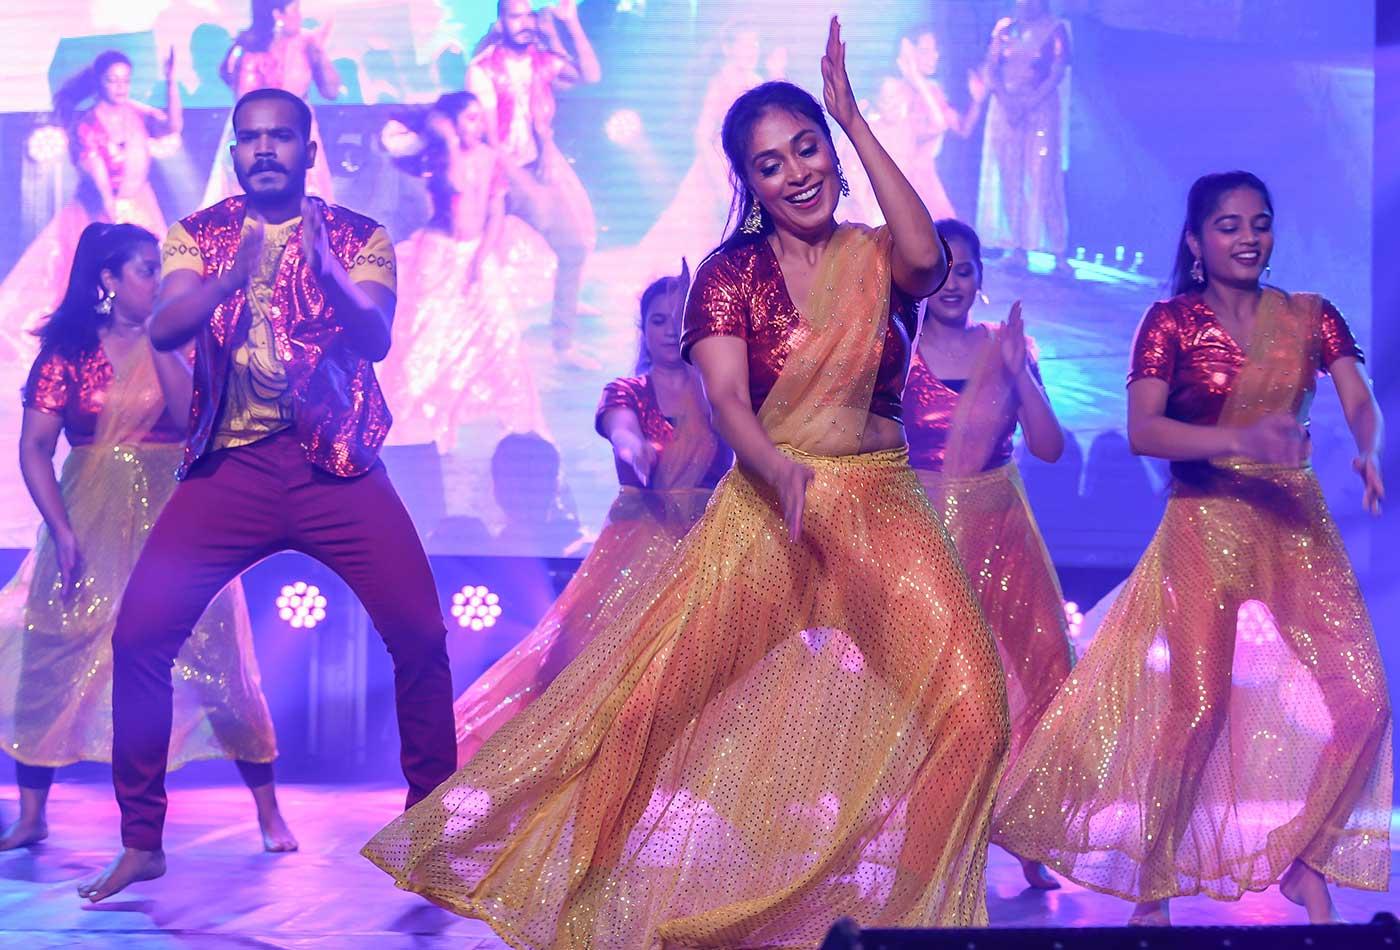 navras-Bollywood-dance-company-amsterdam-min